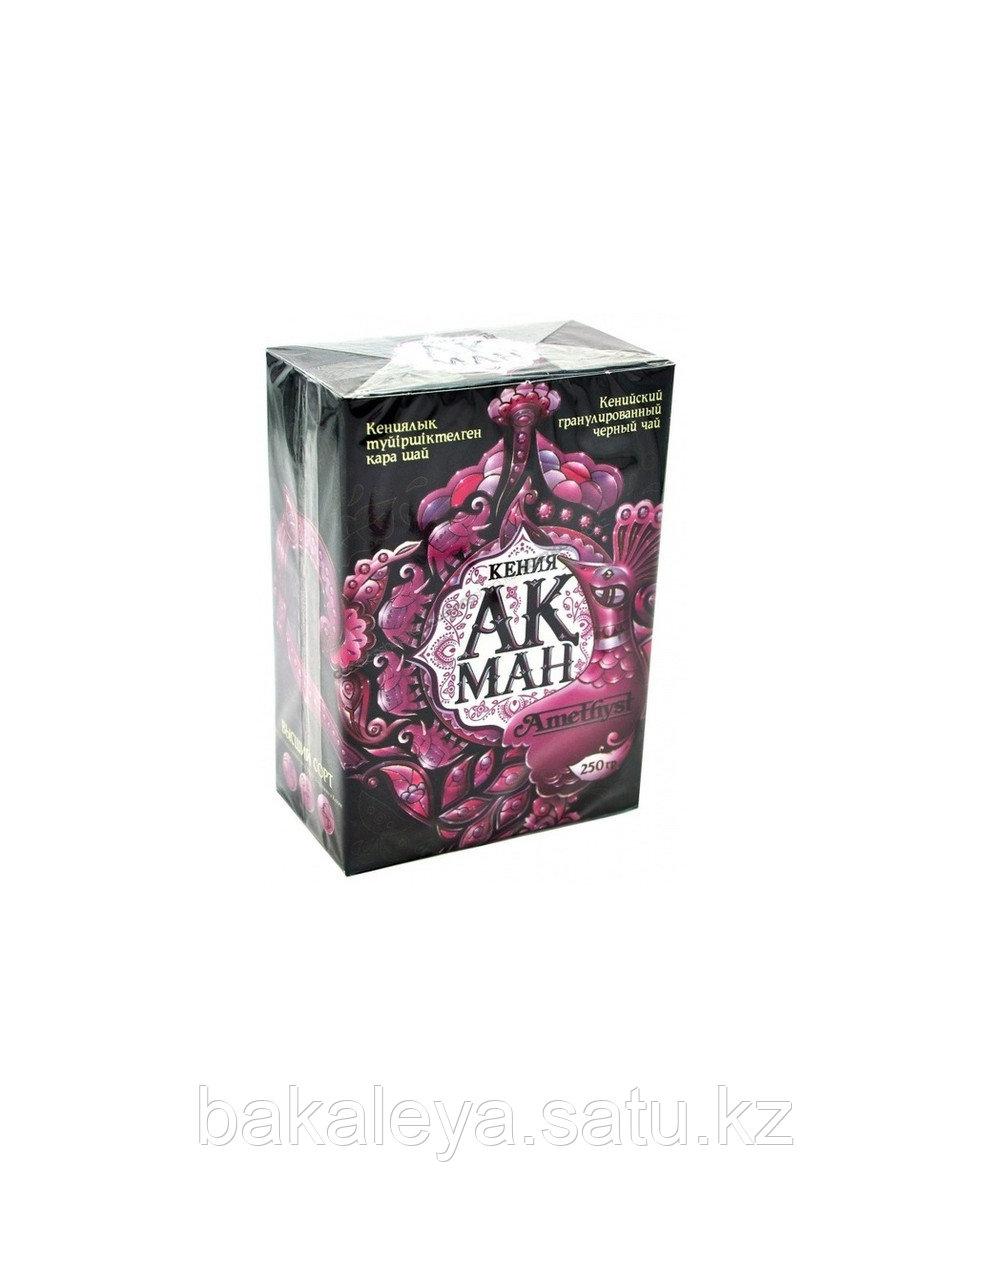 Чай Ақман «Amethyst» 500 гр